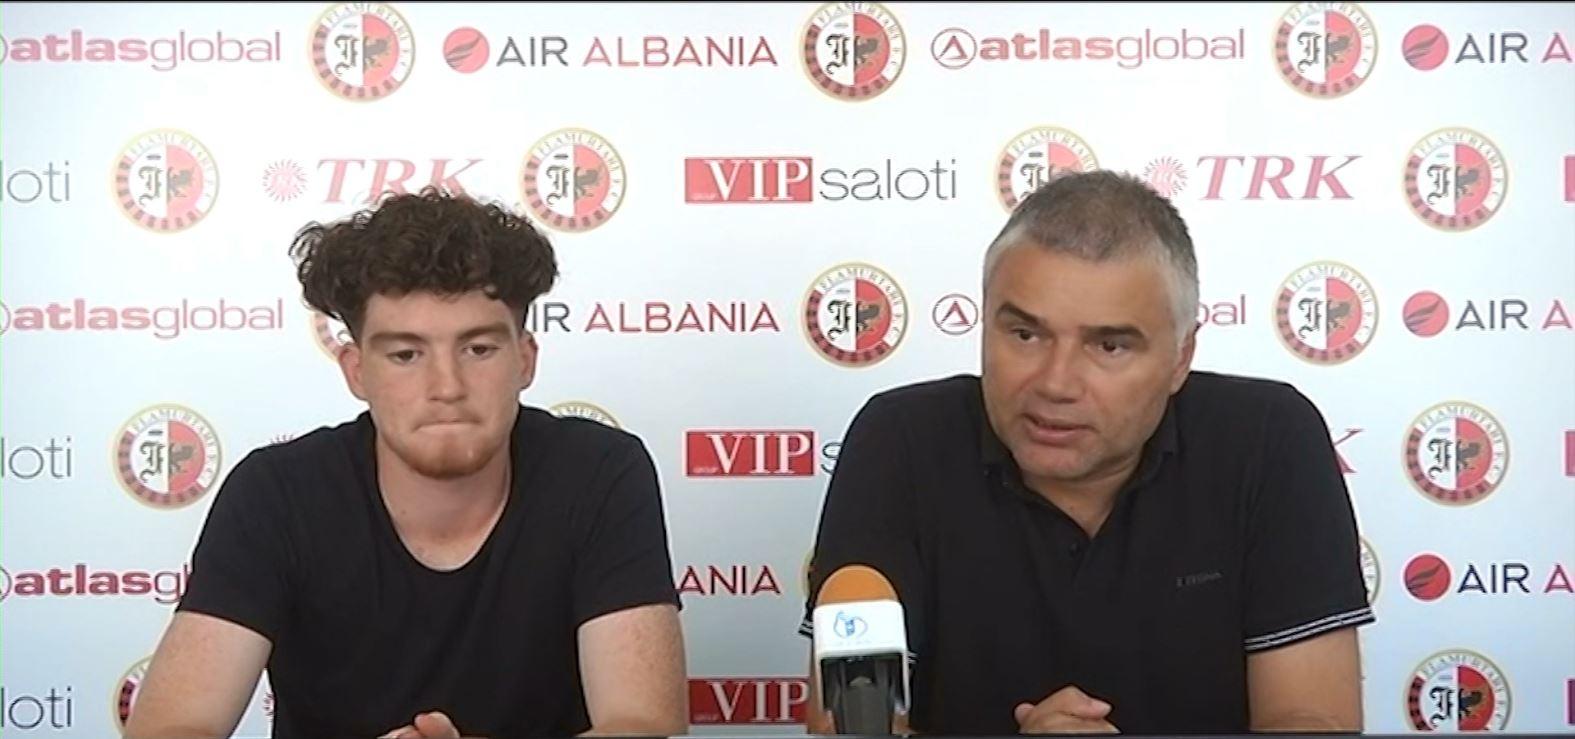 Administratori i Flamurtarit Sinan Idrizi sfidon trajnerin e Skënderbeut Ilir Daja